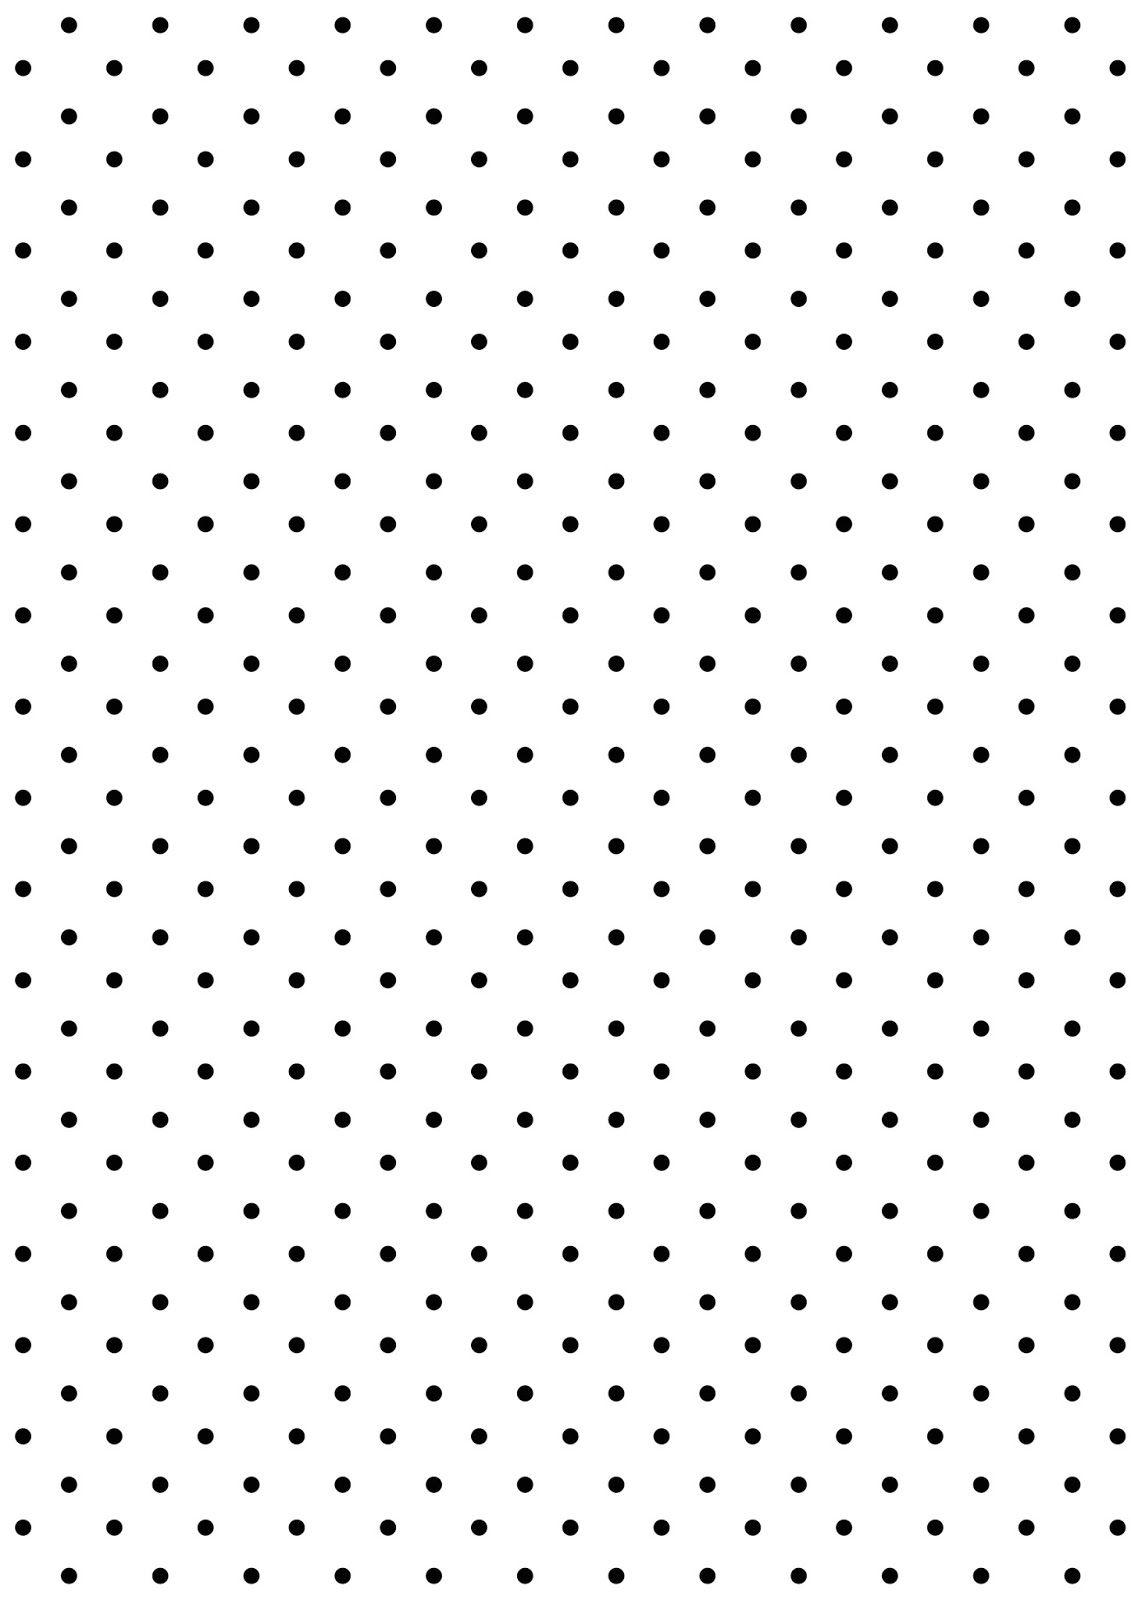 Polka Dot Patterns on Pinterest